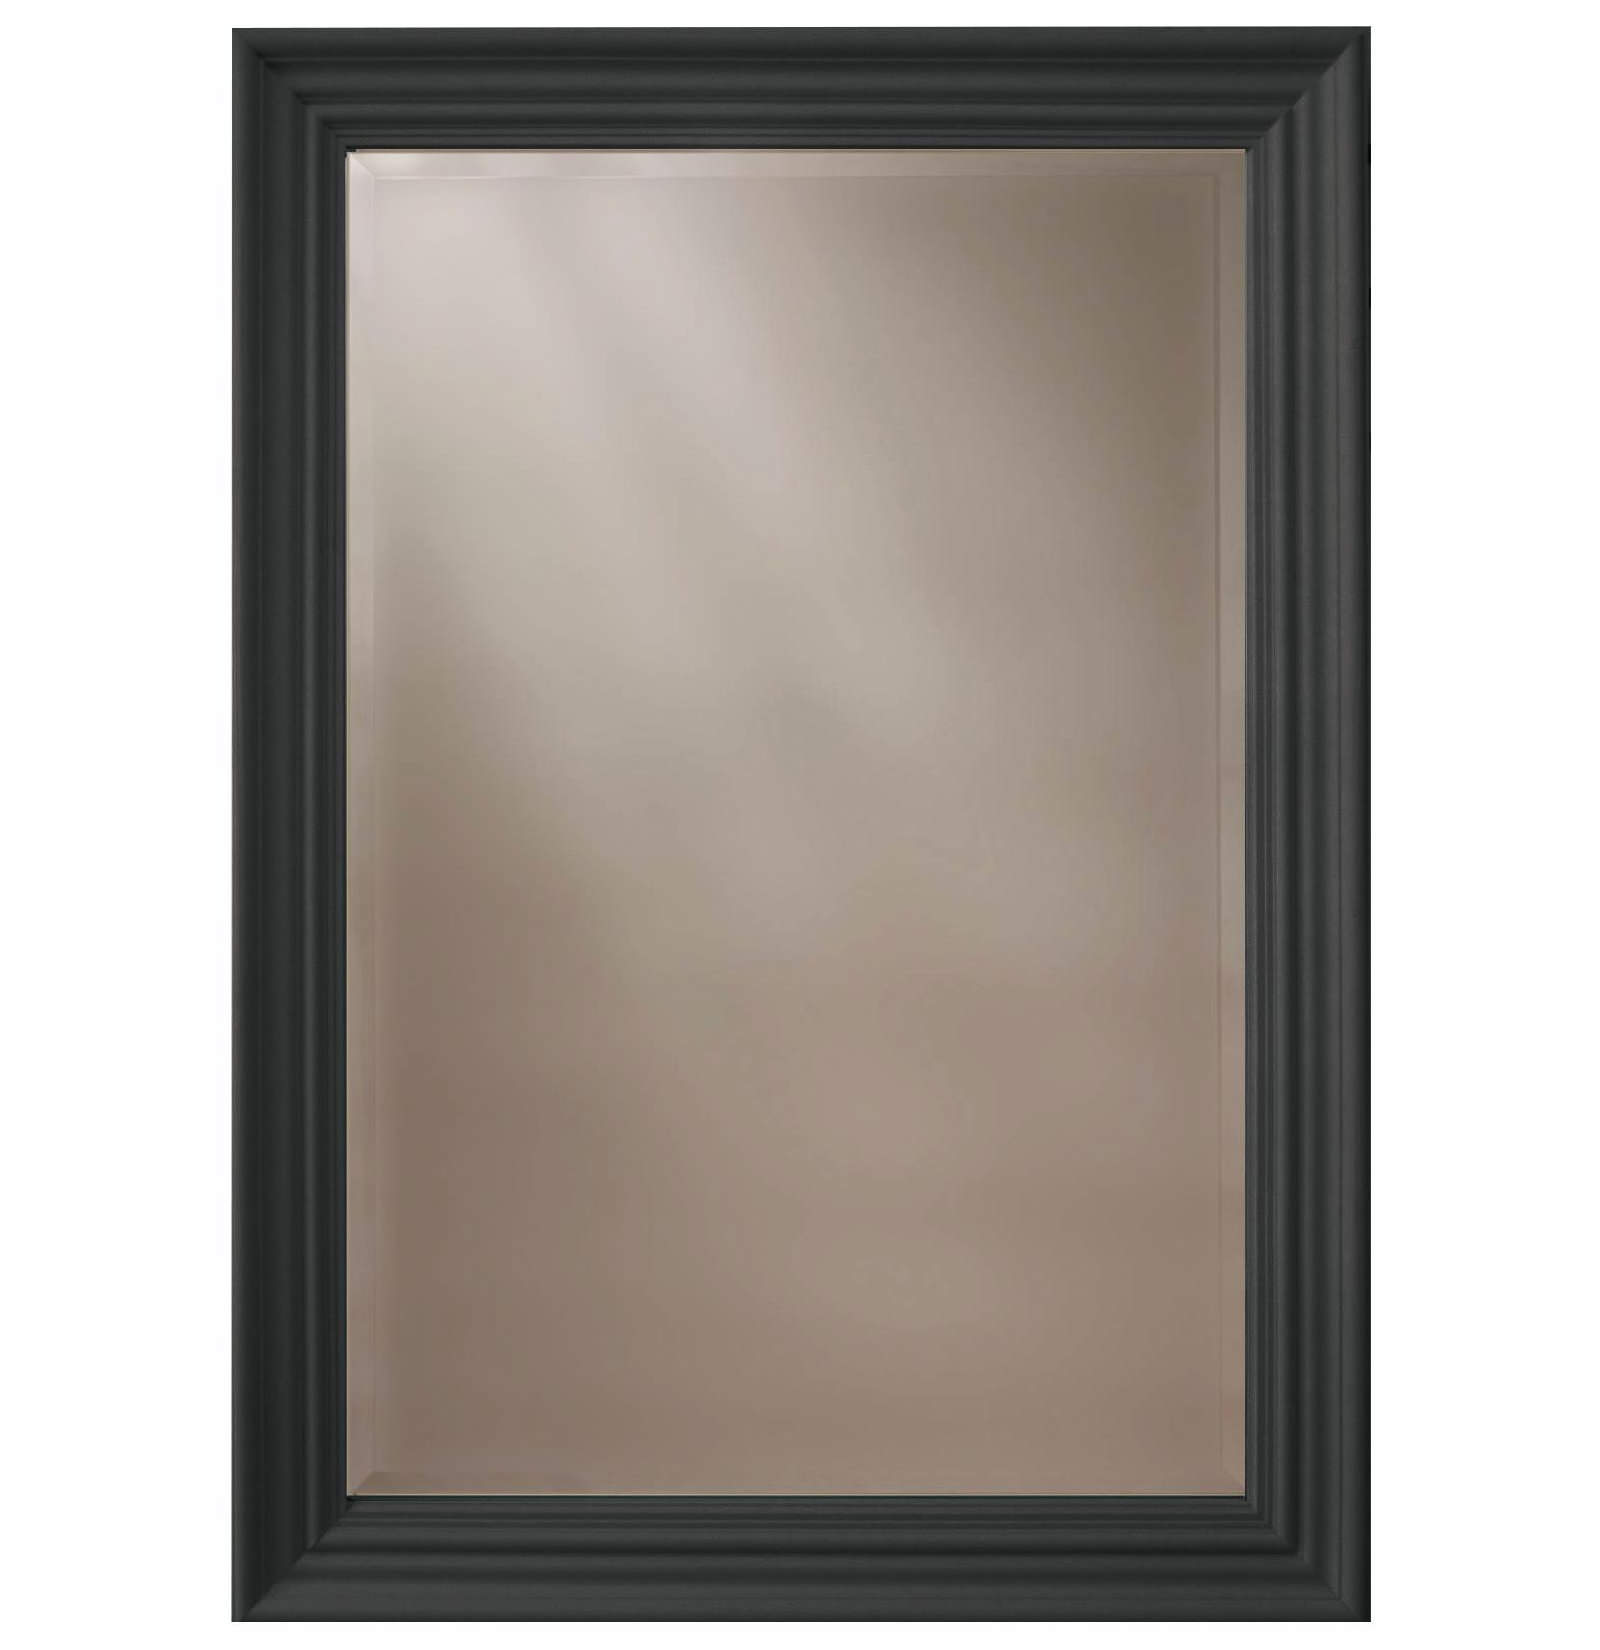 Heritage Edgeware Onyx Black Wooden Framed Mirror 660 X 910mm